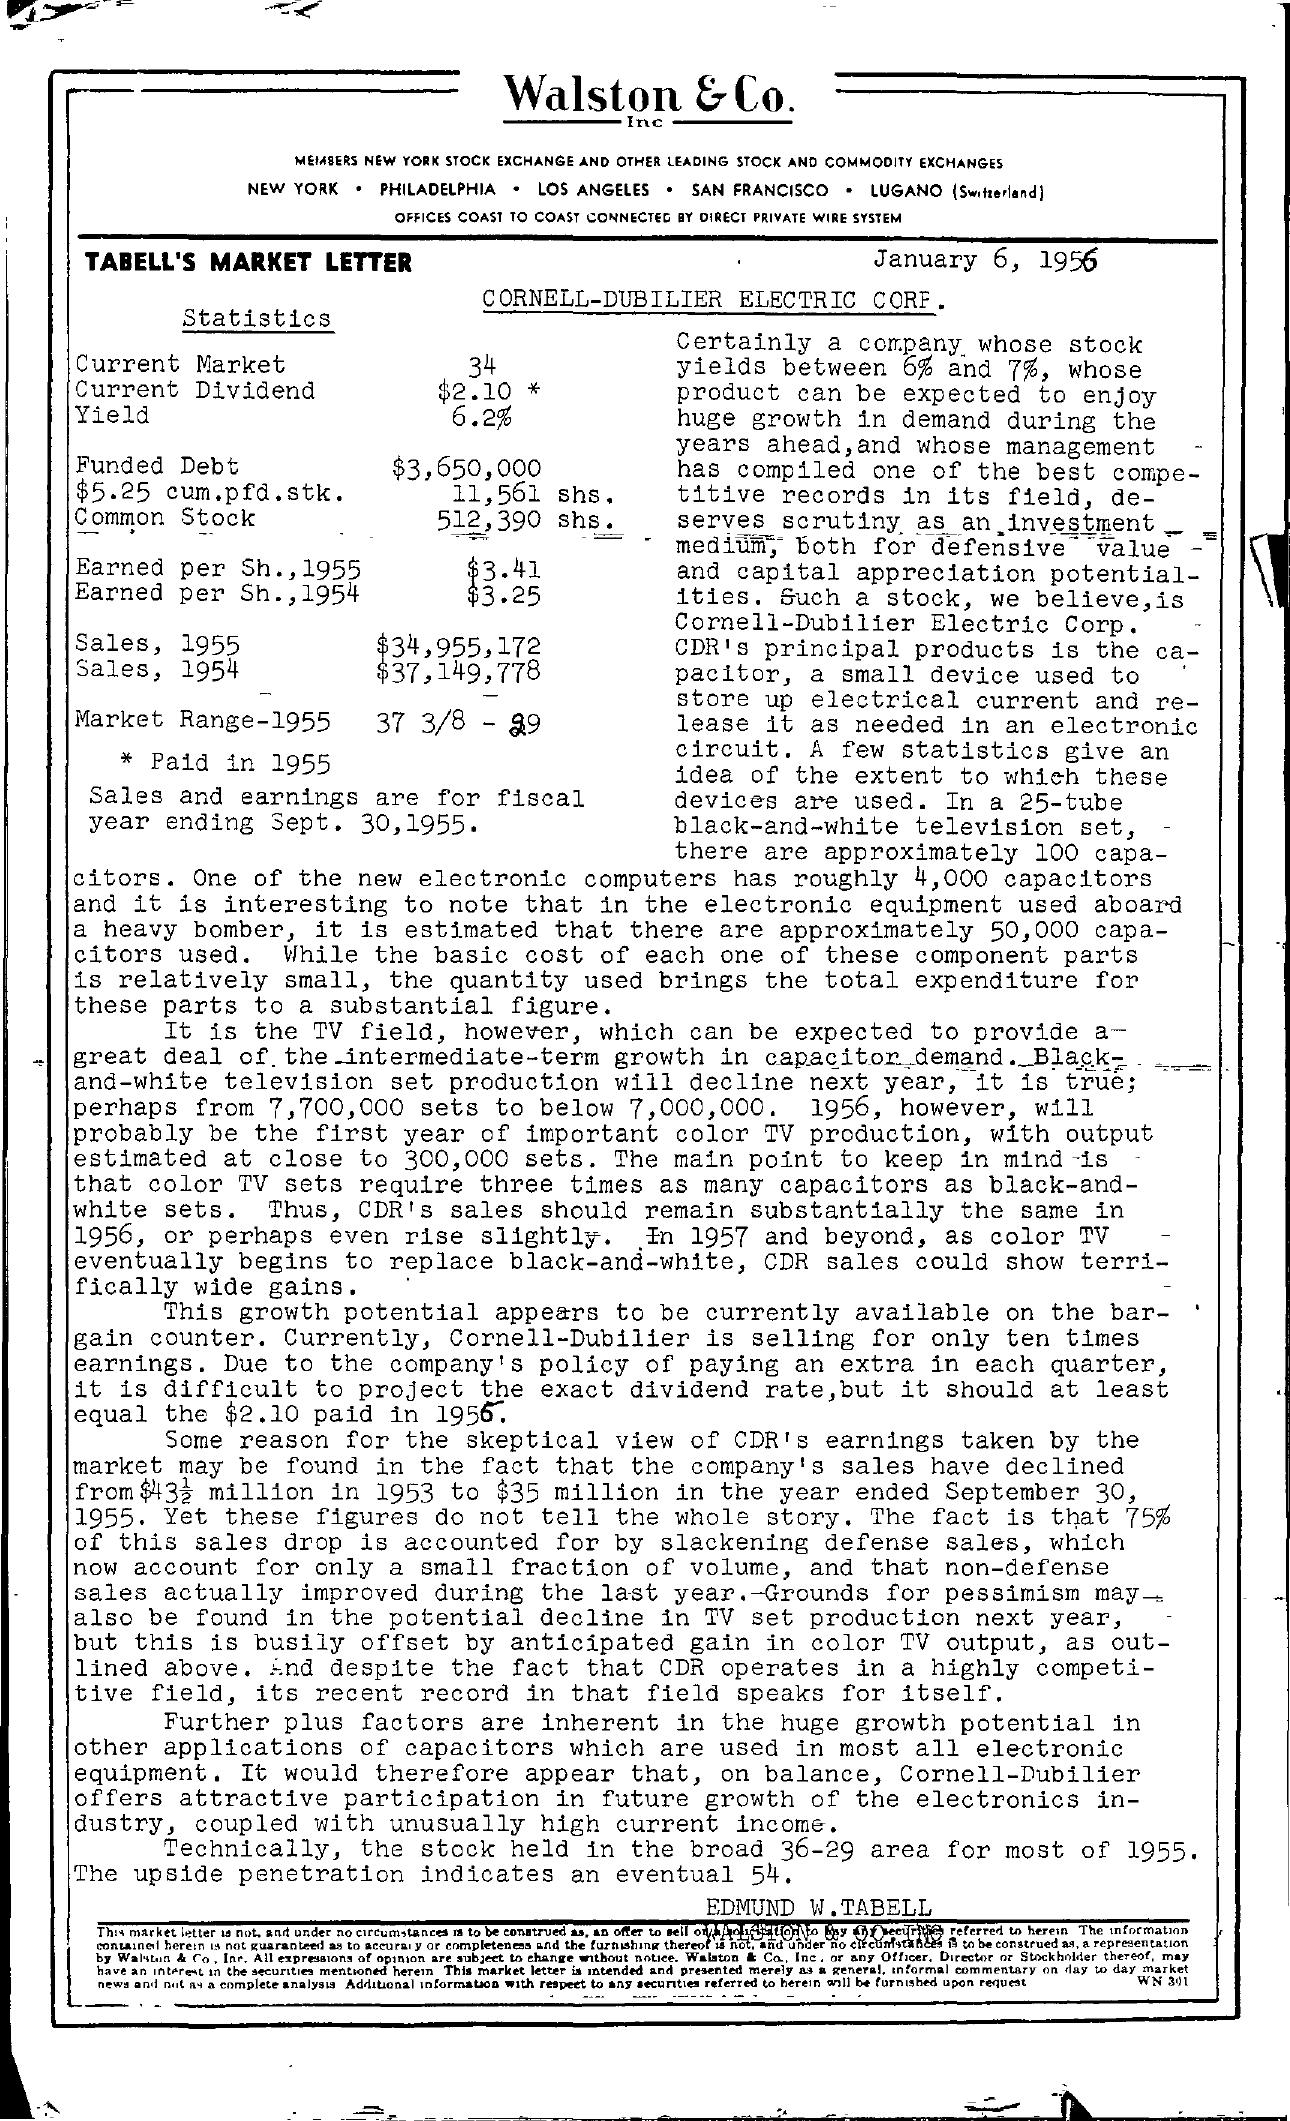 Tabell's Market Letter - January 06, 1956